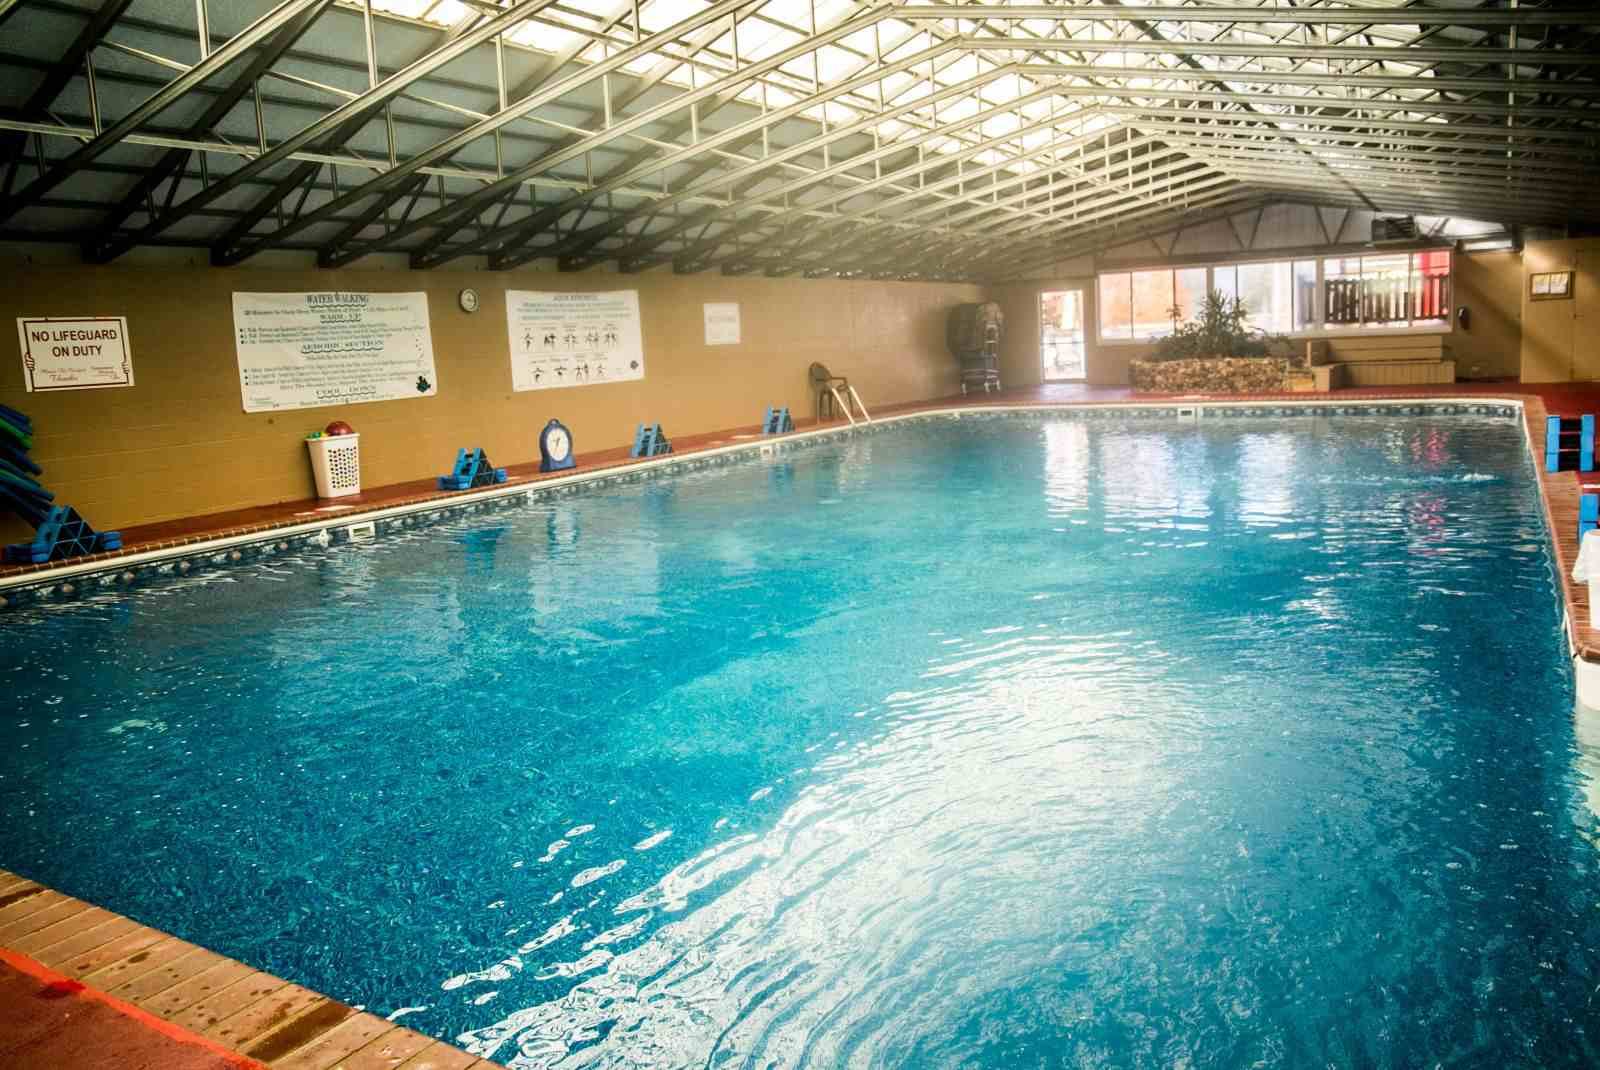 Tennessee Fitness Spa pool